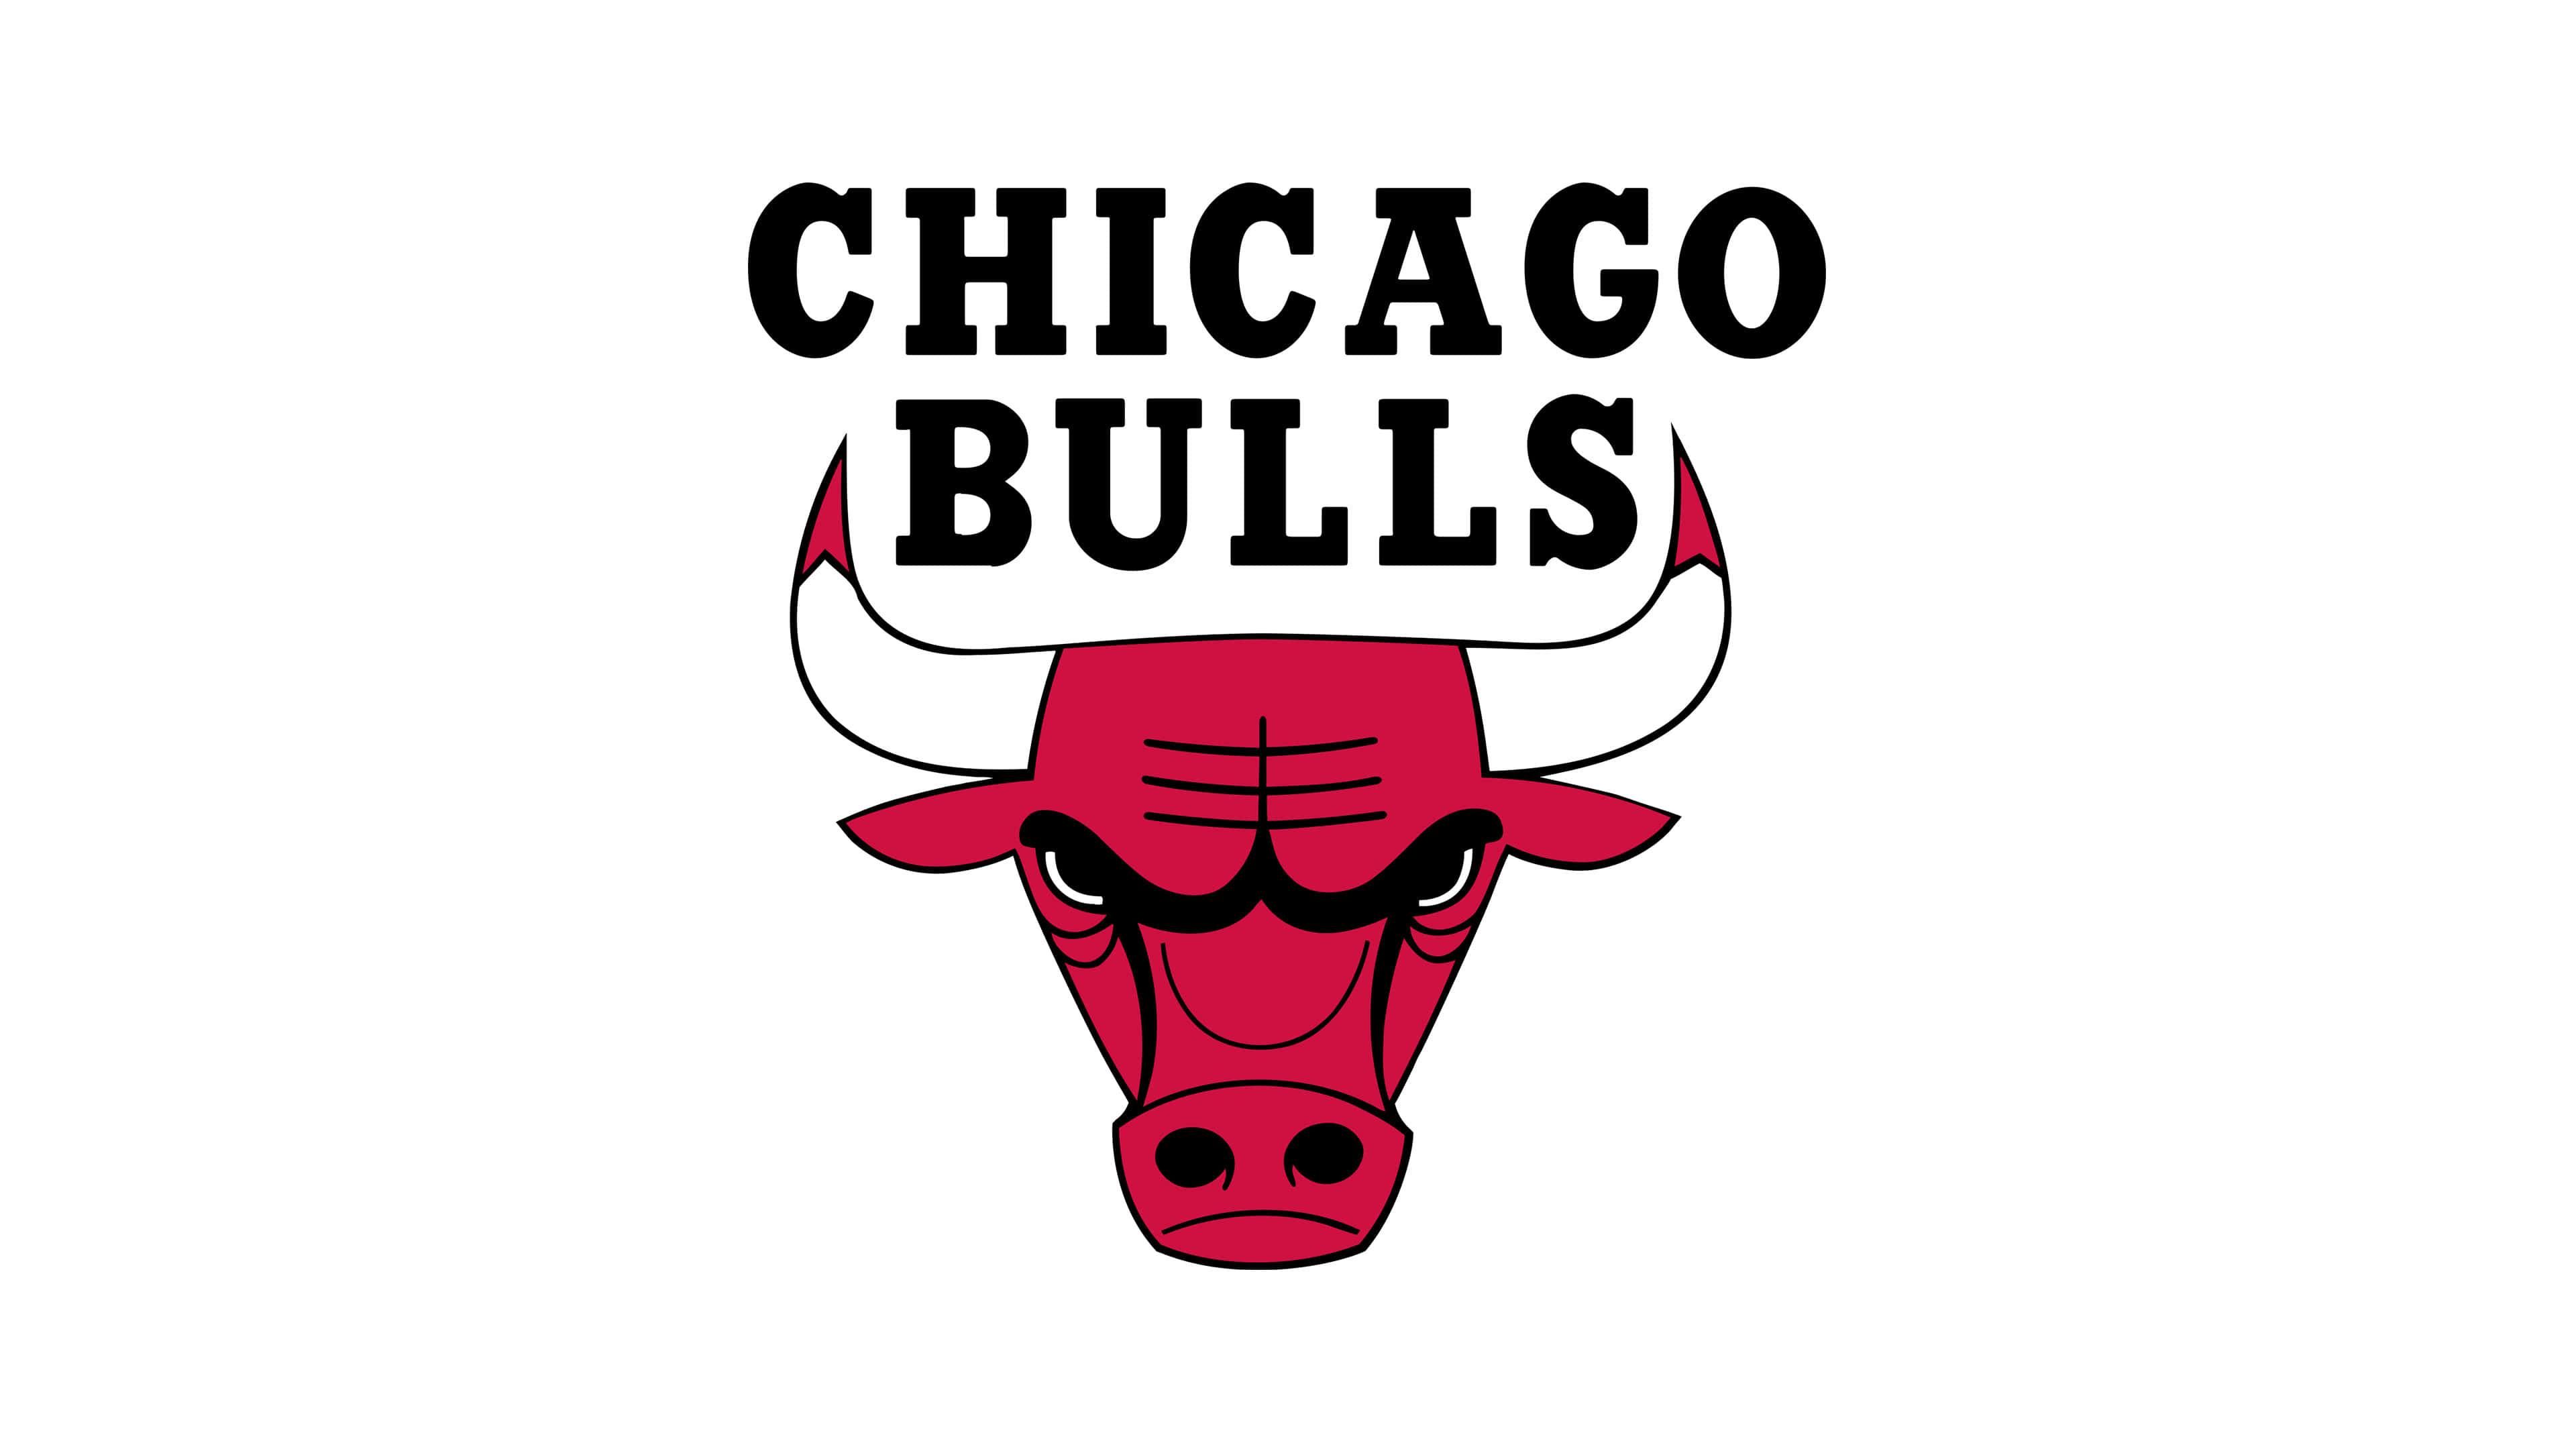 chicago bulls nba logo uhd 4k wallpaper